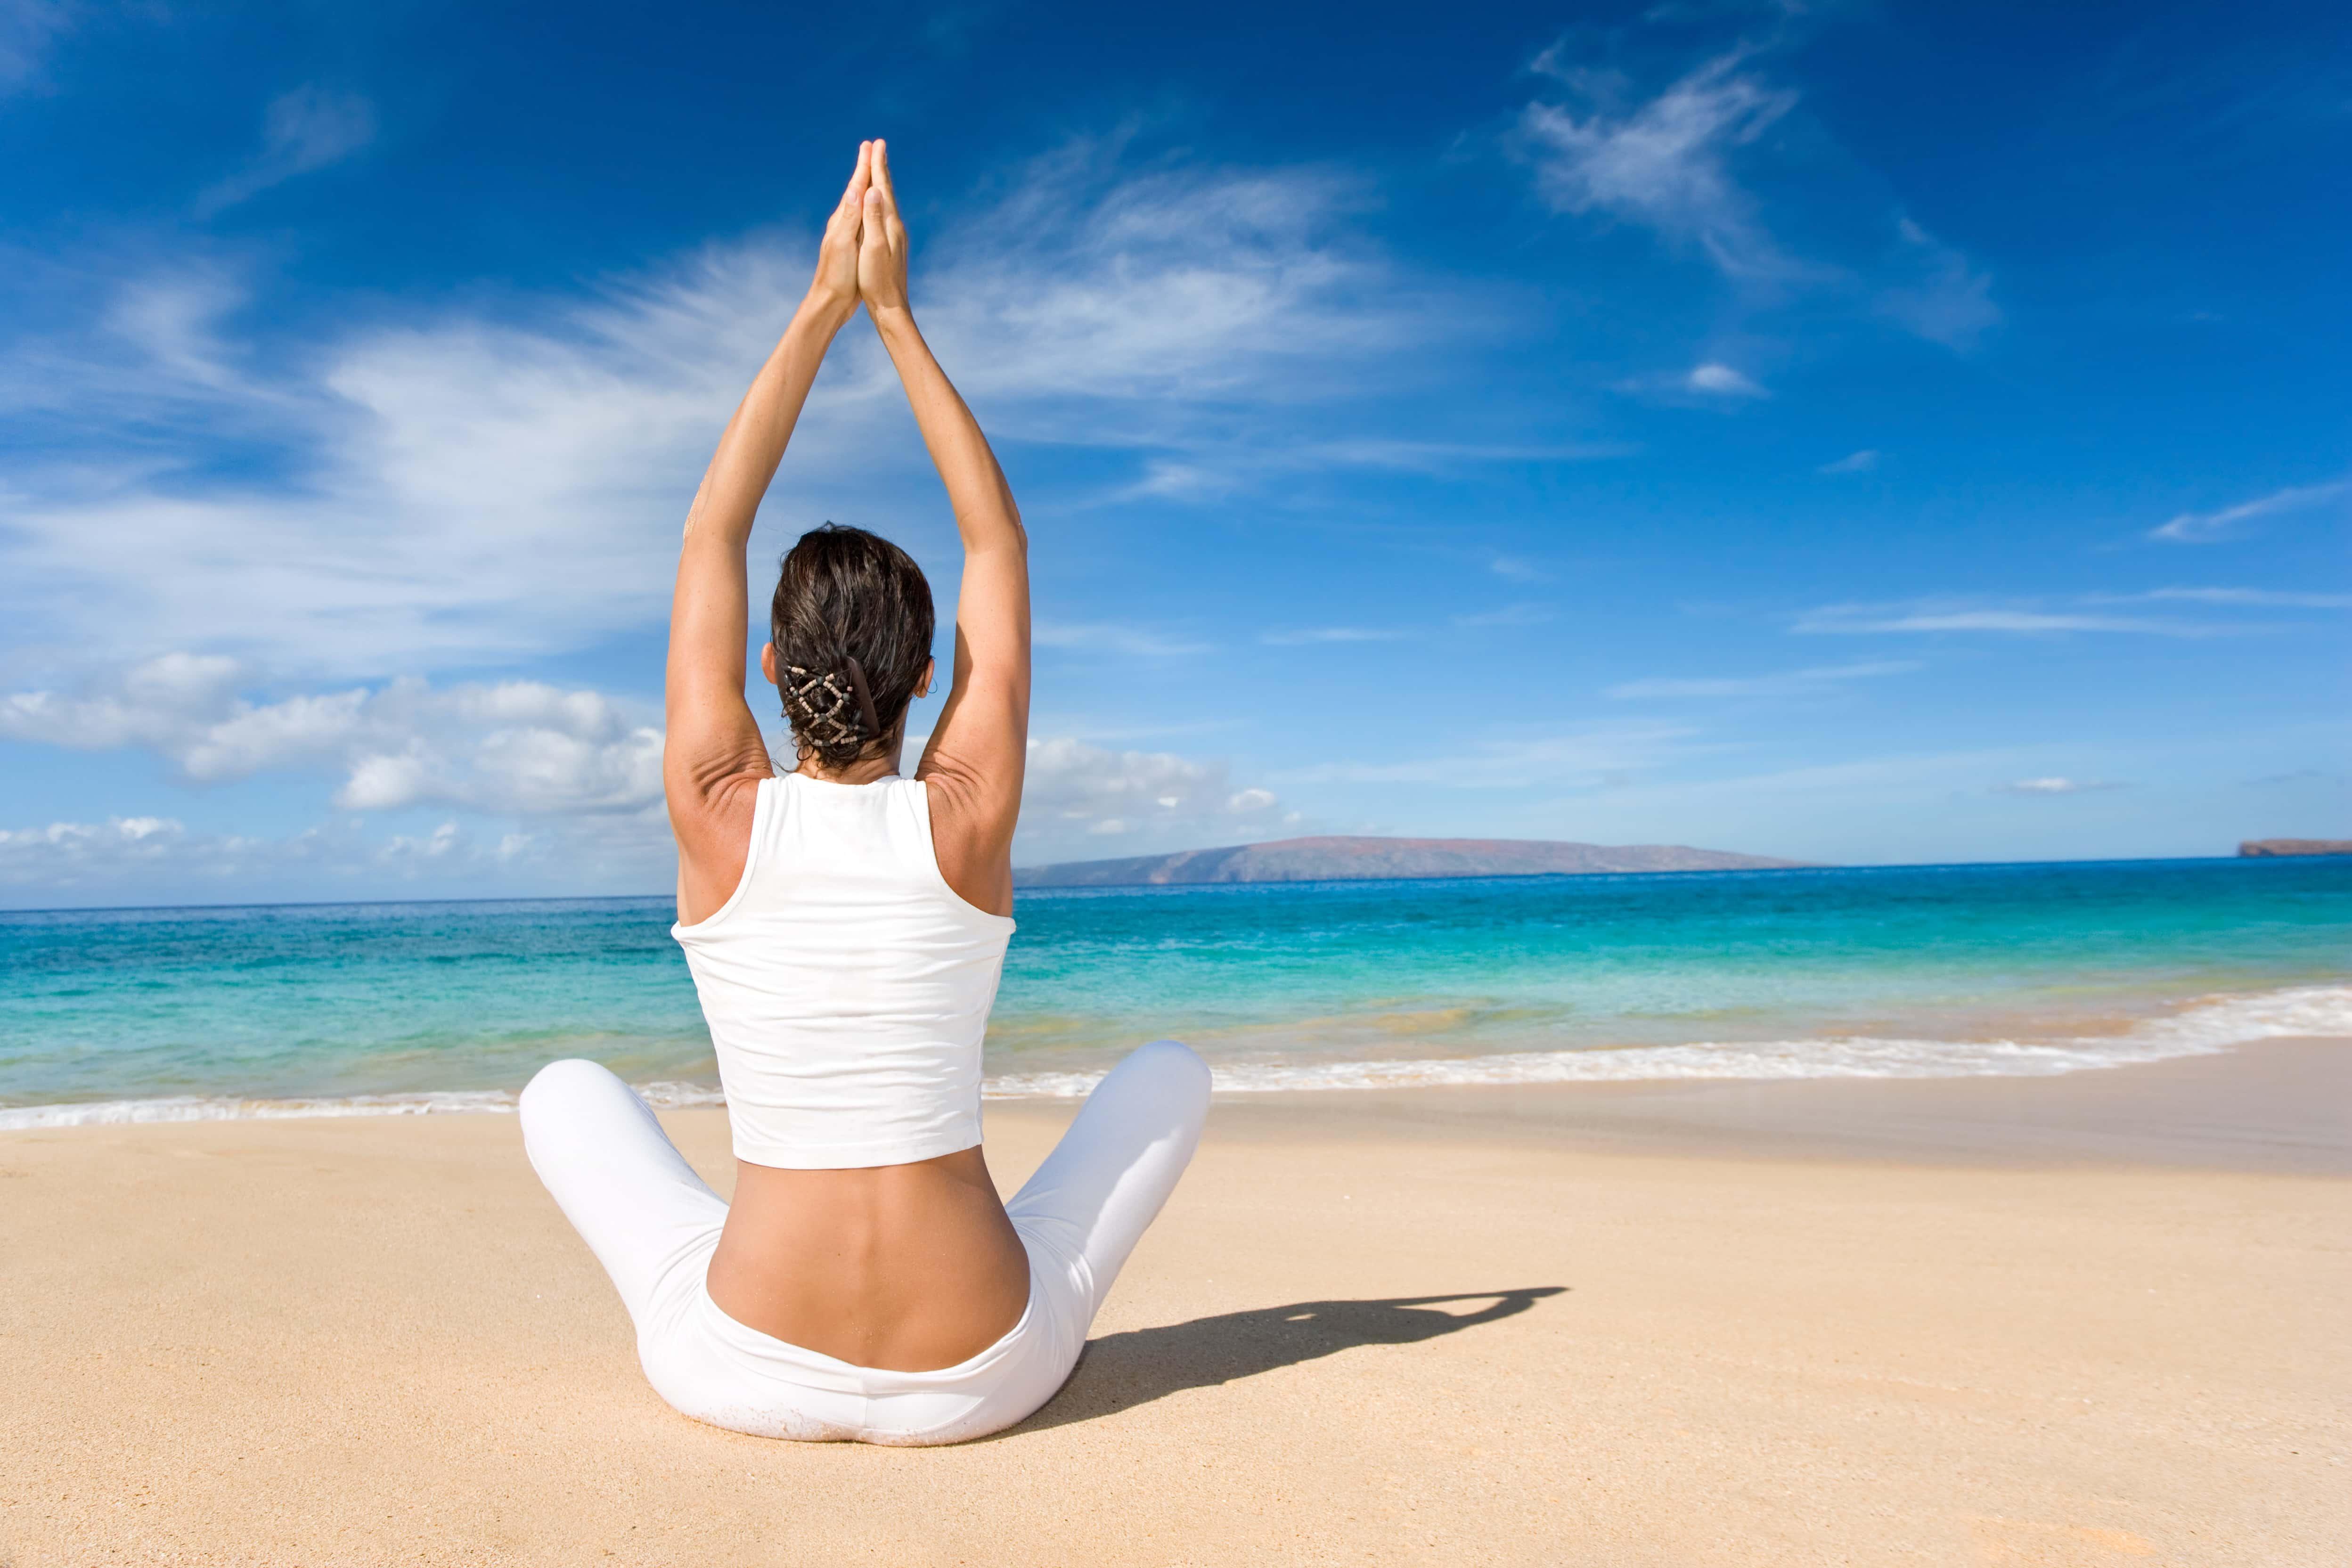 7 days yoga, meditation in kauai